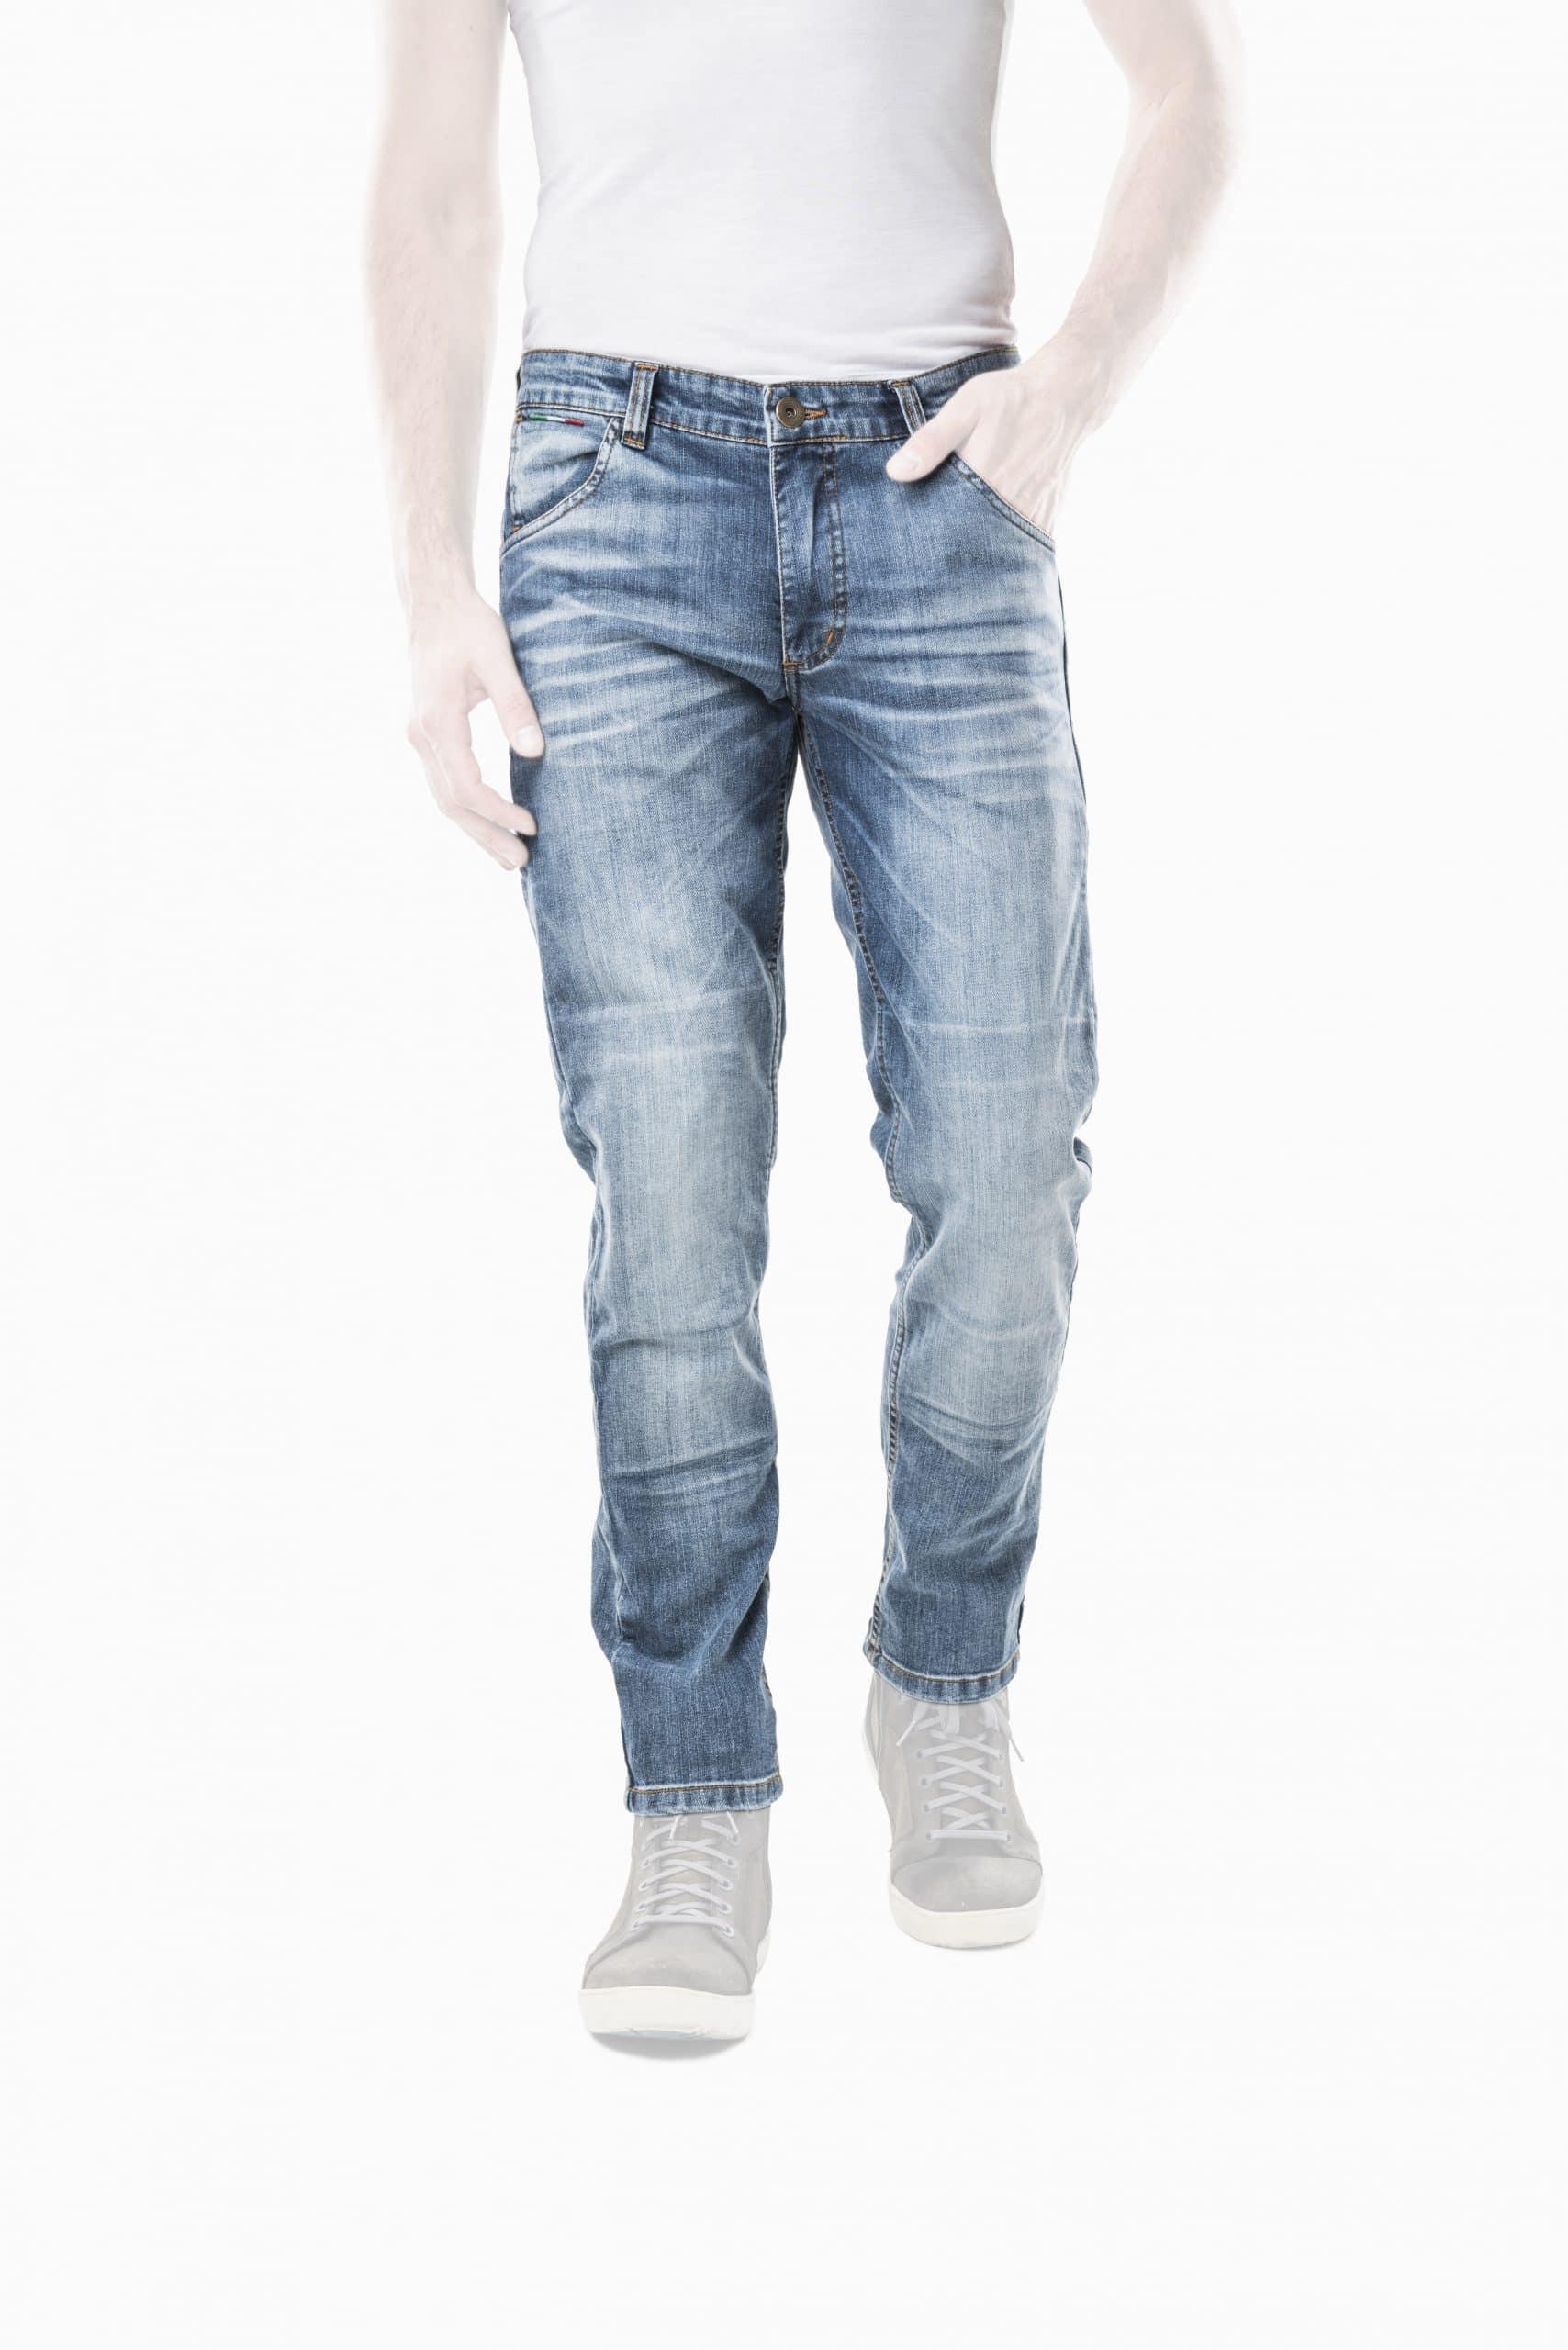 Mens Motorcycle Skinny Slim FIT Denim Jeans with Dupont/™ Kevlar/® Lining Dark Blue